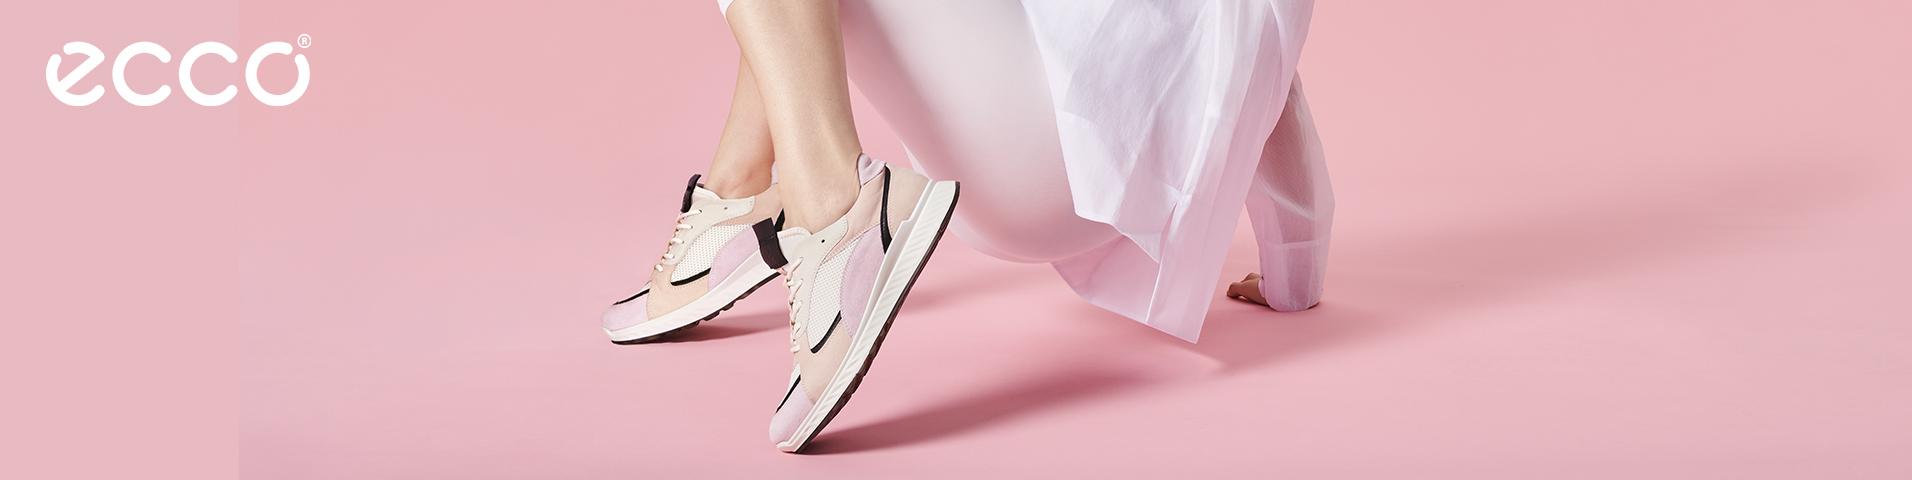 Ecco Romeinse sandalen dames online kopen | ZALANDO